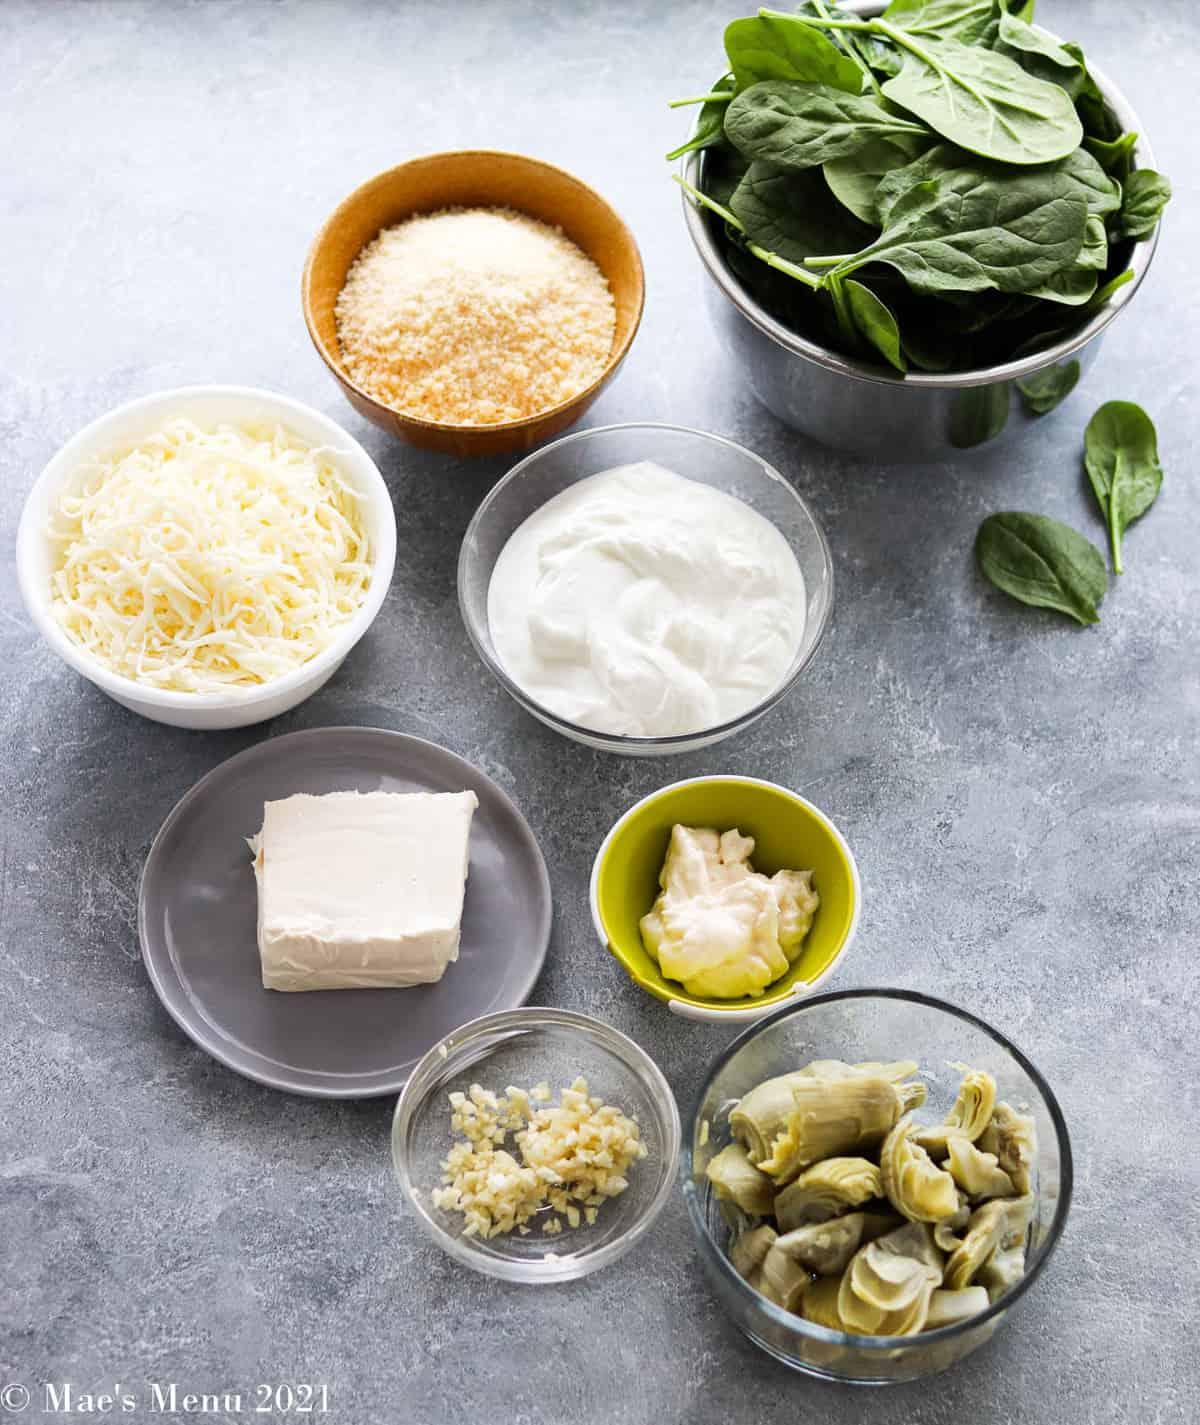 All the ingredients for spinach artichoke dip: mozzarella cheese, parmesan, Greek yogurt, baby spinach, light cream cheese, mayonnaise, artichoke hearts, and garlic